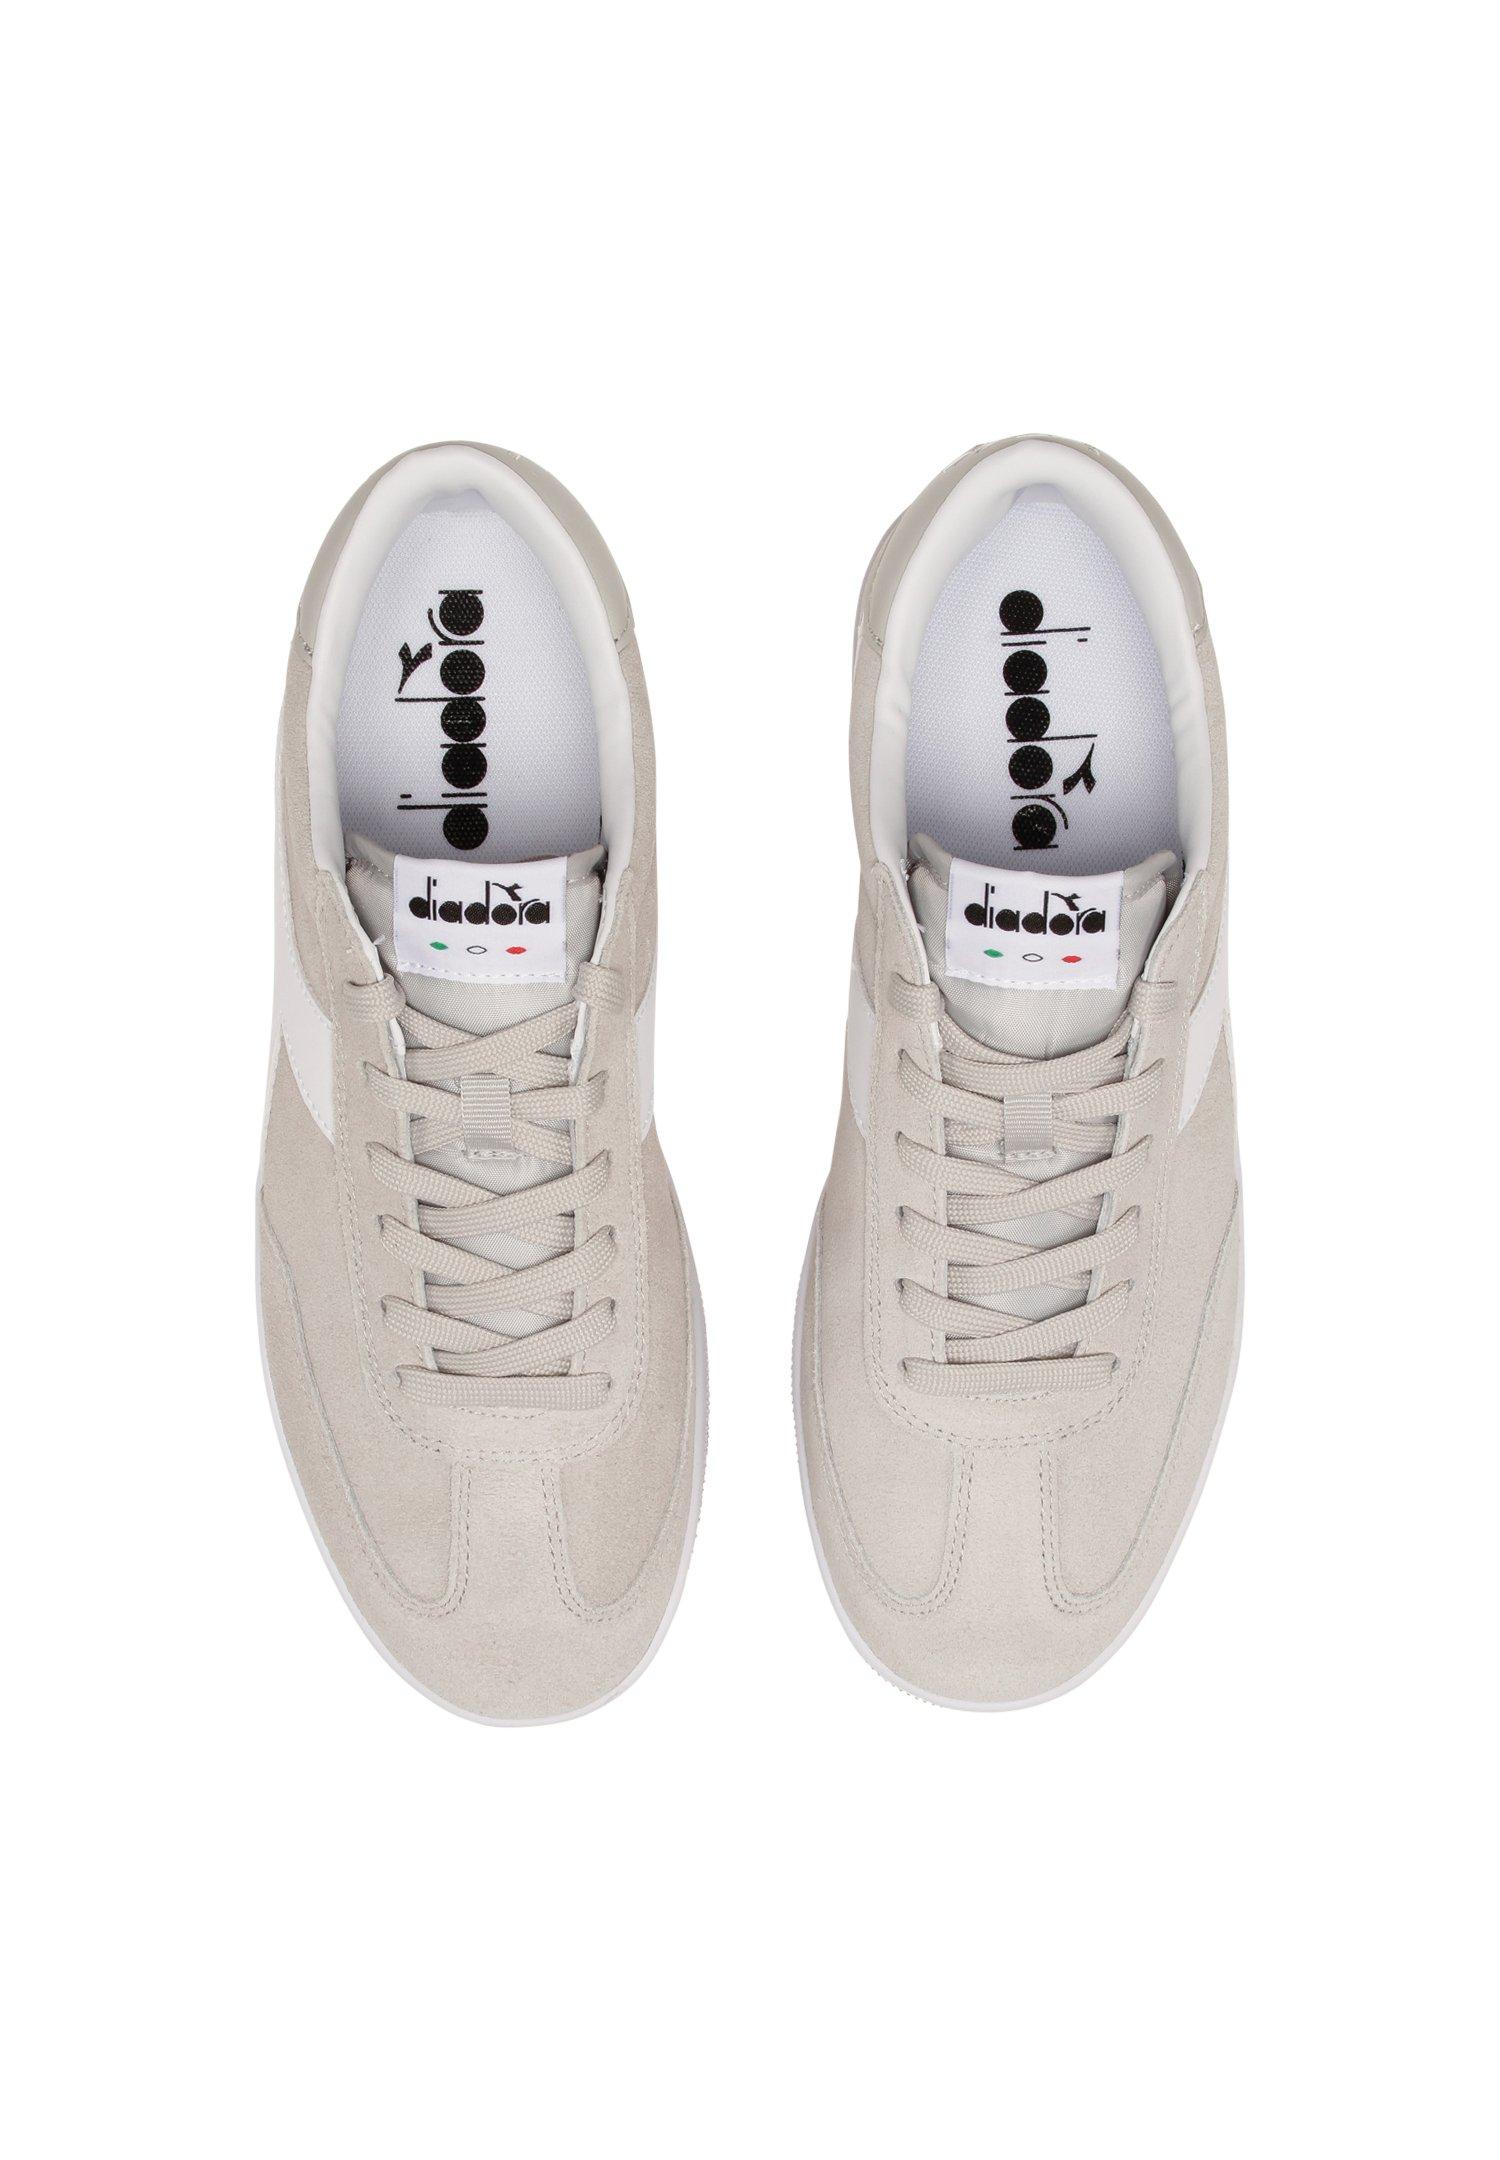 Diadora Field - Sneakers Basse 75031 Mastice M5dW63r